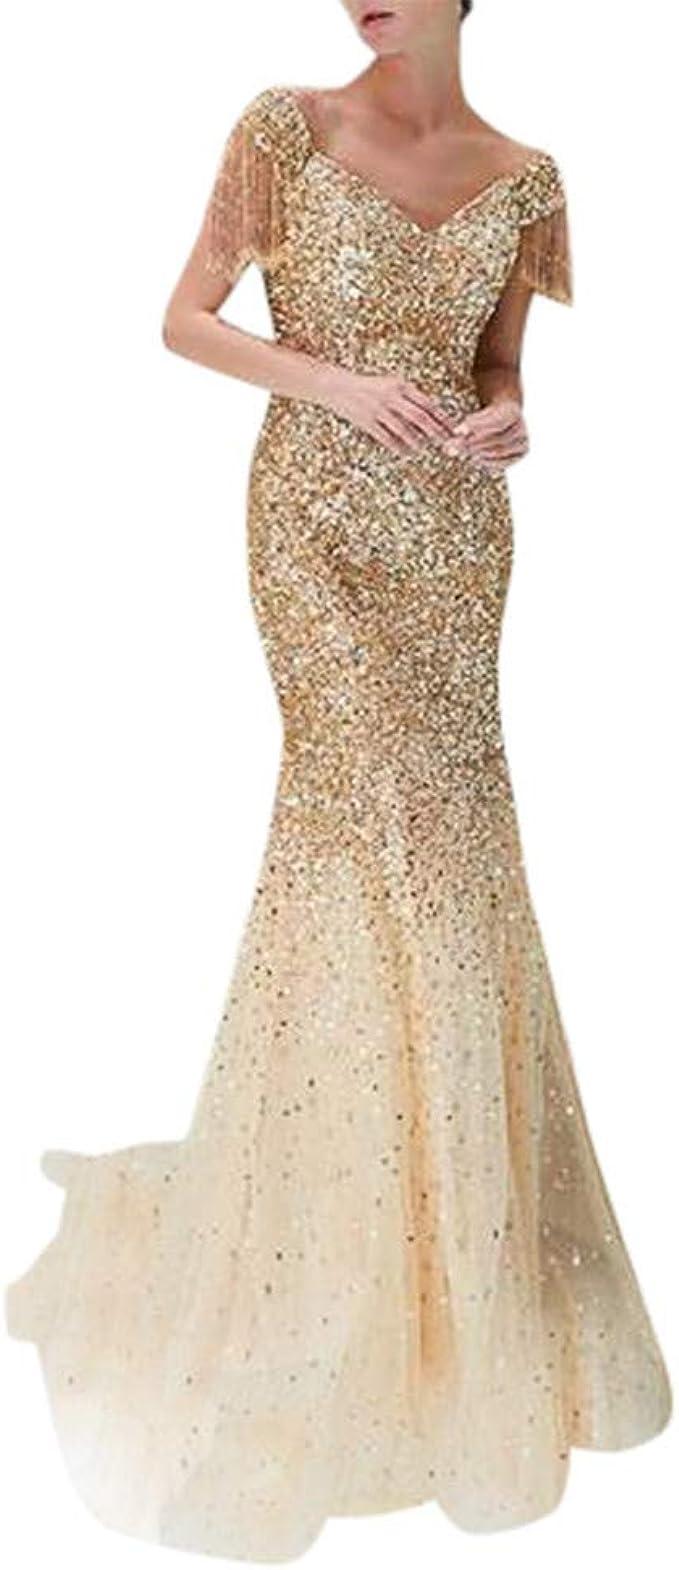 Aiserkly Abendkleider Damen Sexy V-Ausschnitt Partykleid Ärmellos